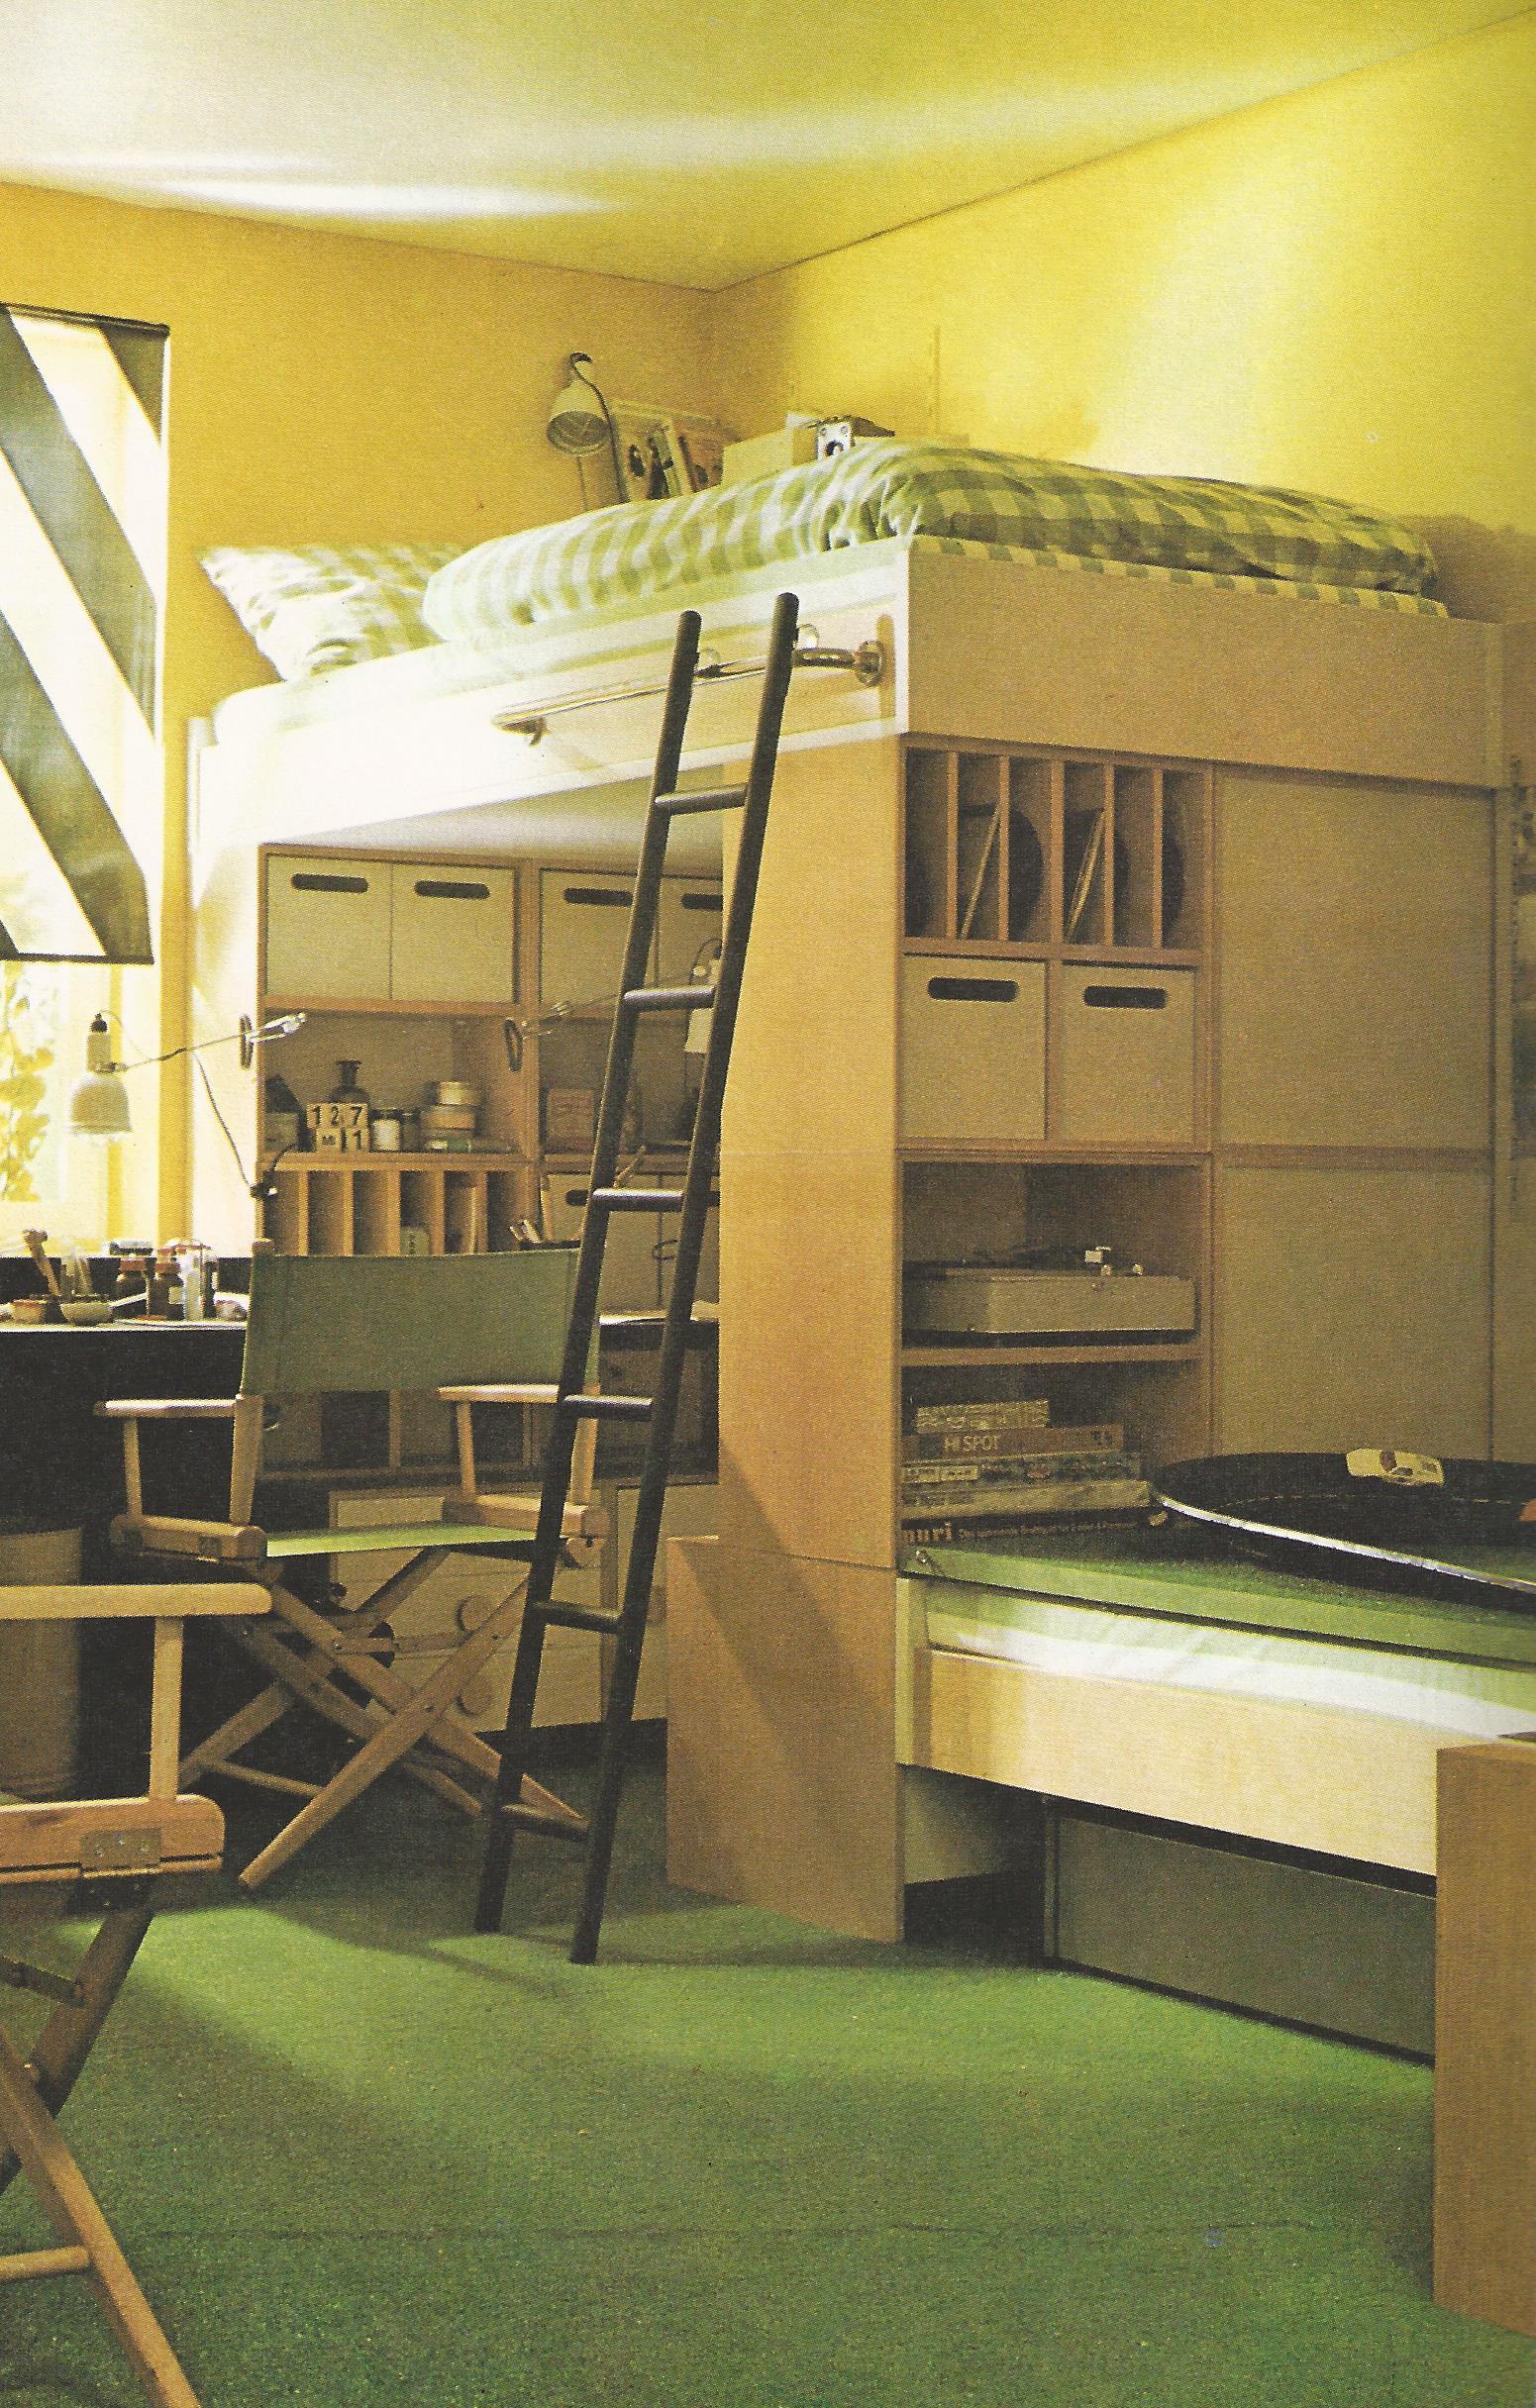 61x40x28cm Mini Folding Computer Desk/Portable Aluminium